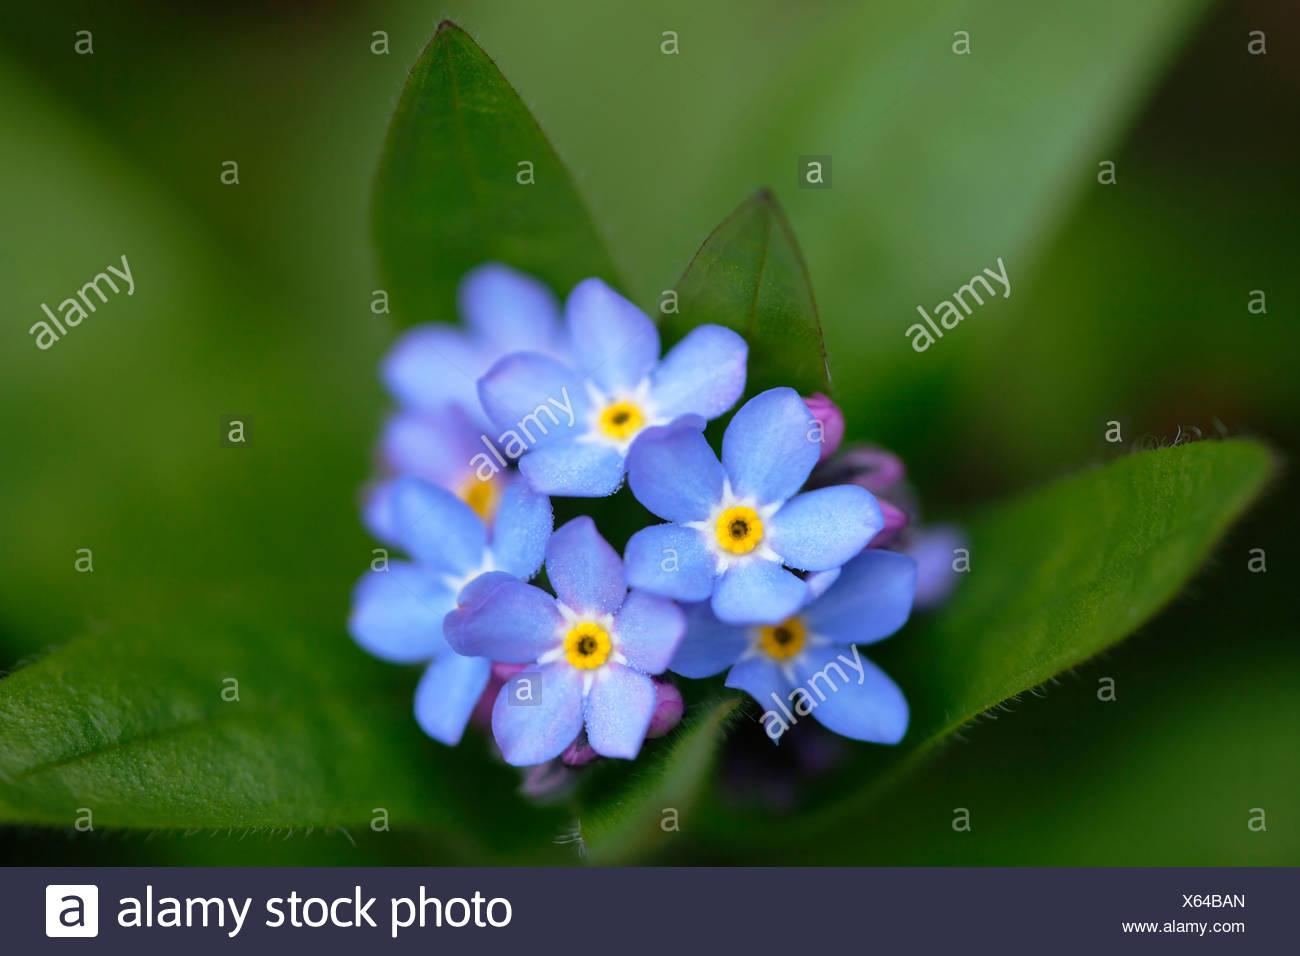 Forget me not myosotis scorpioides cluster of small blue flowers forget me not myosotis scorpioides cluster of small blue flowers izmirmasajfo